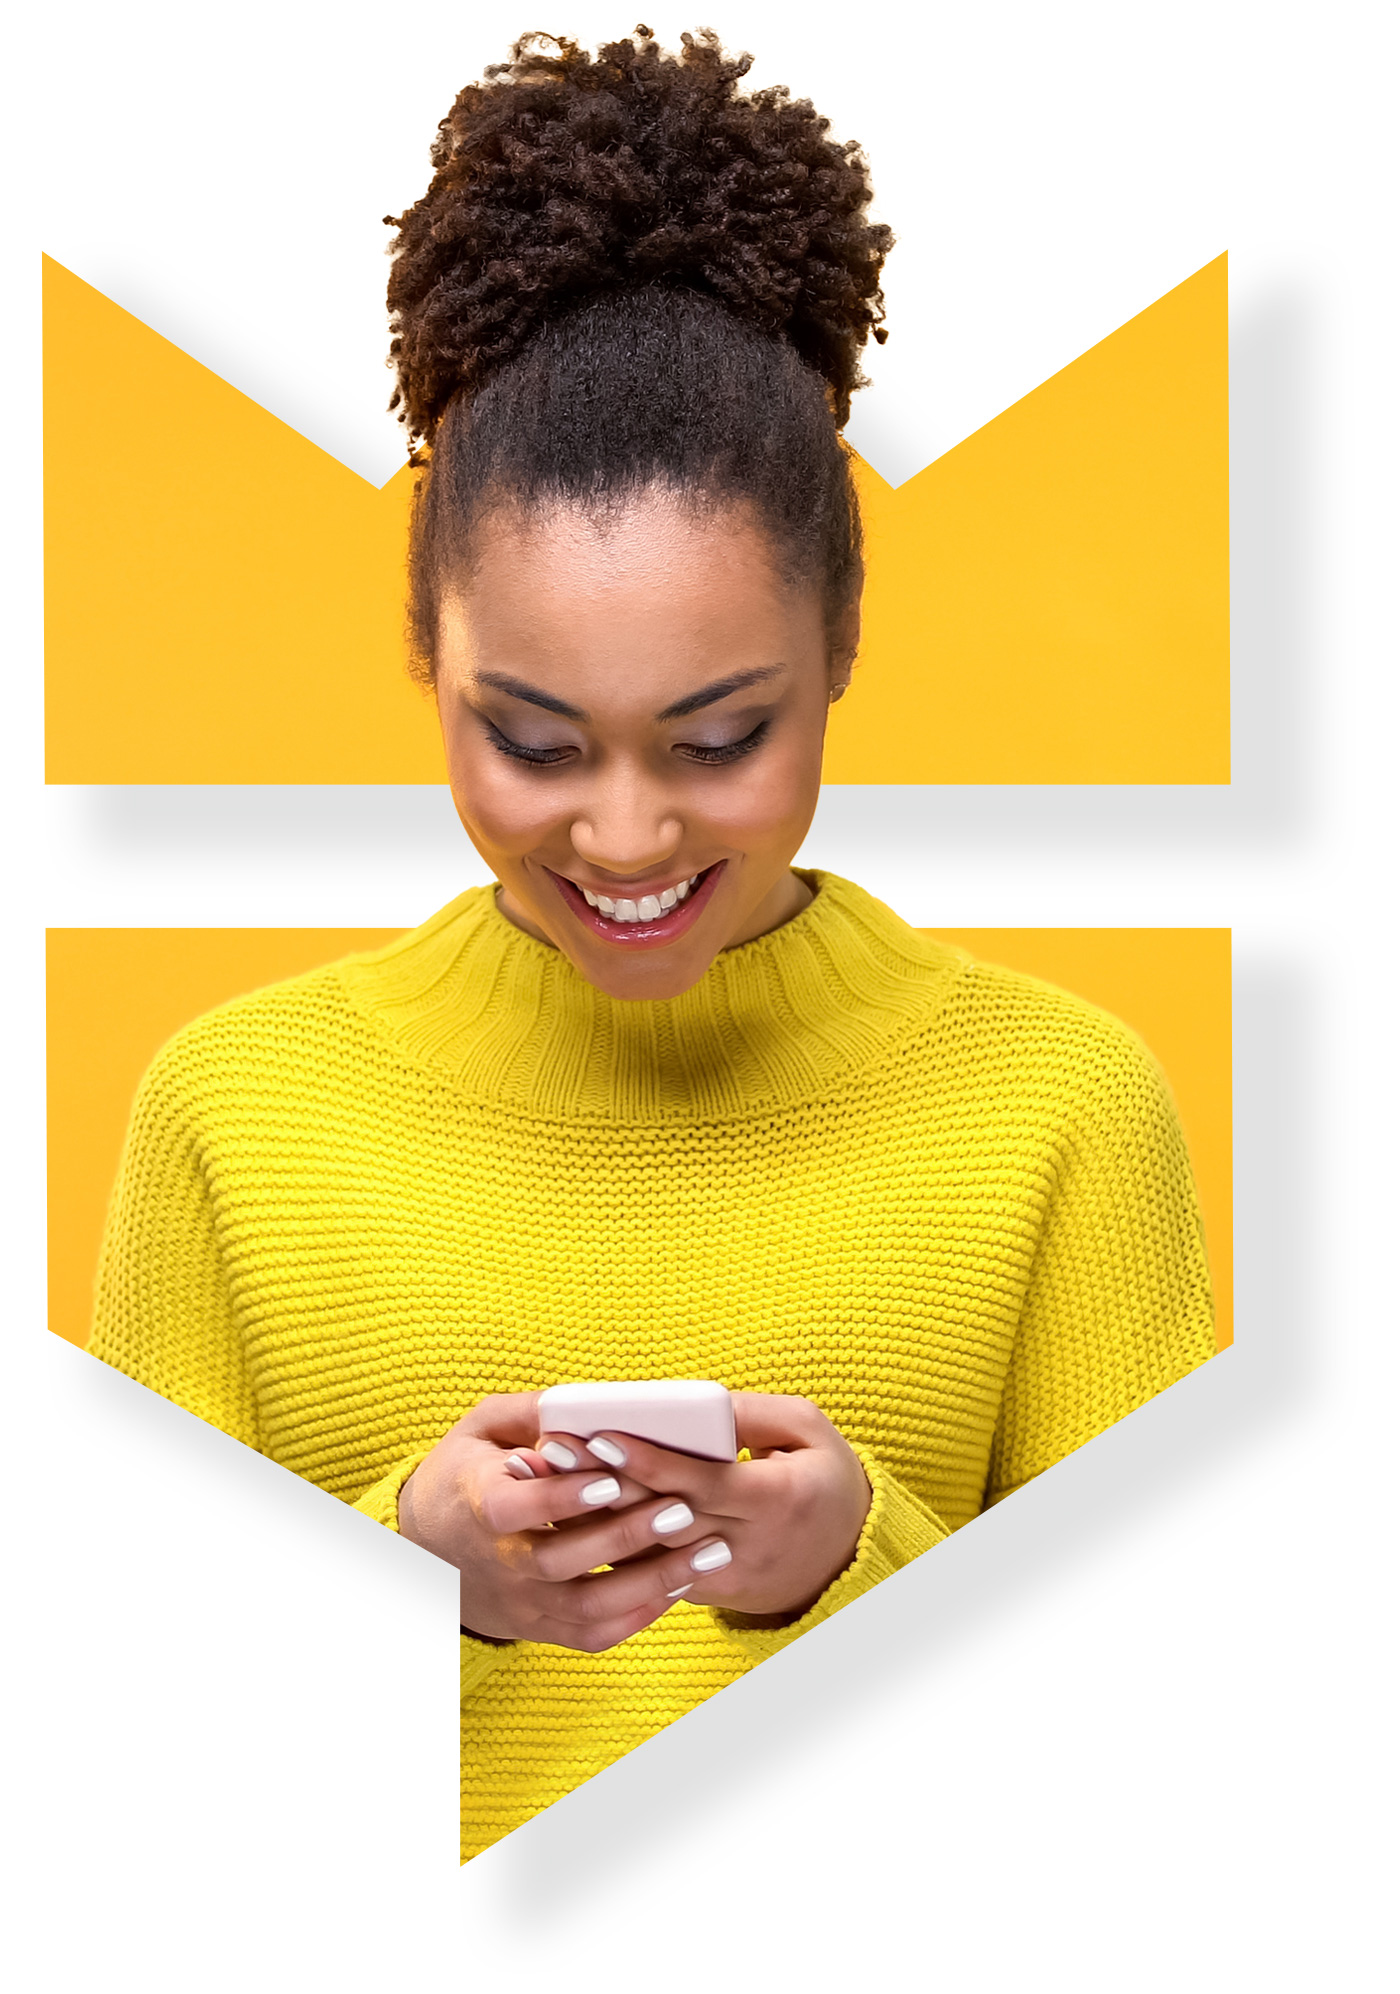 Person enjoying TextDealKing offers on phone